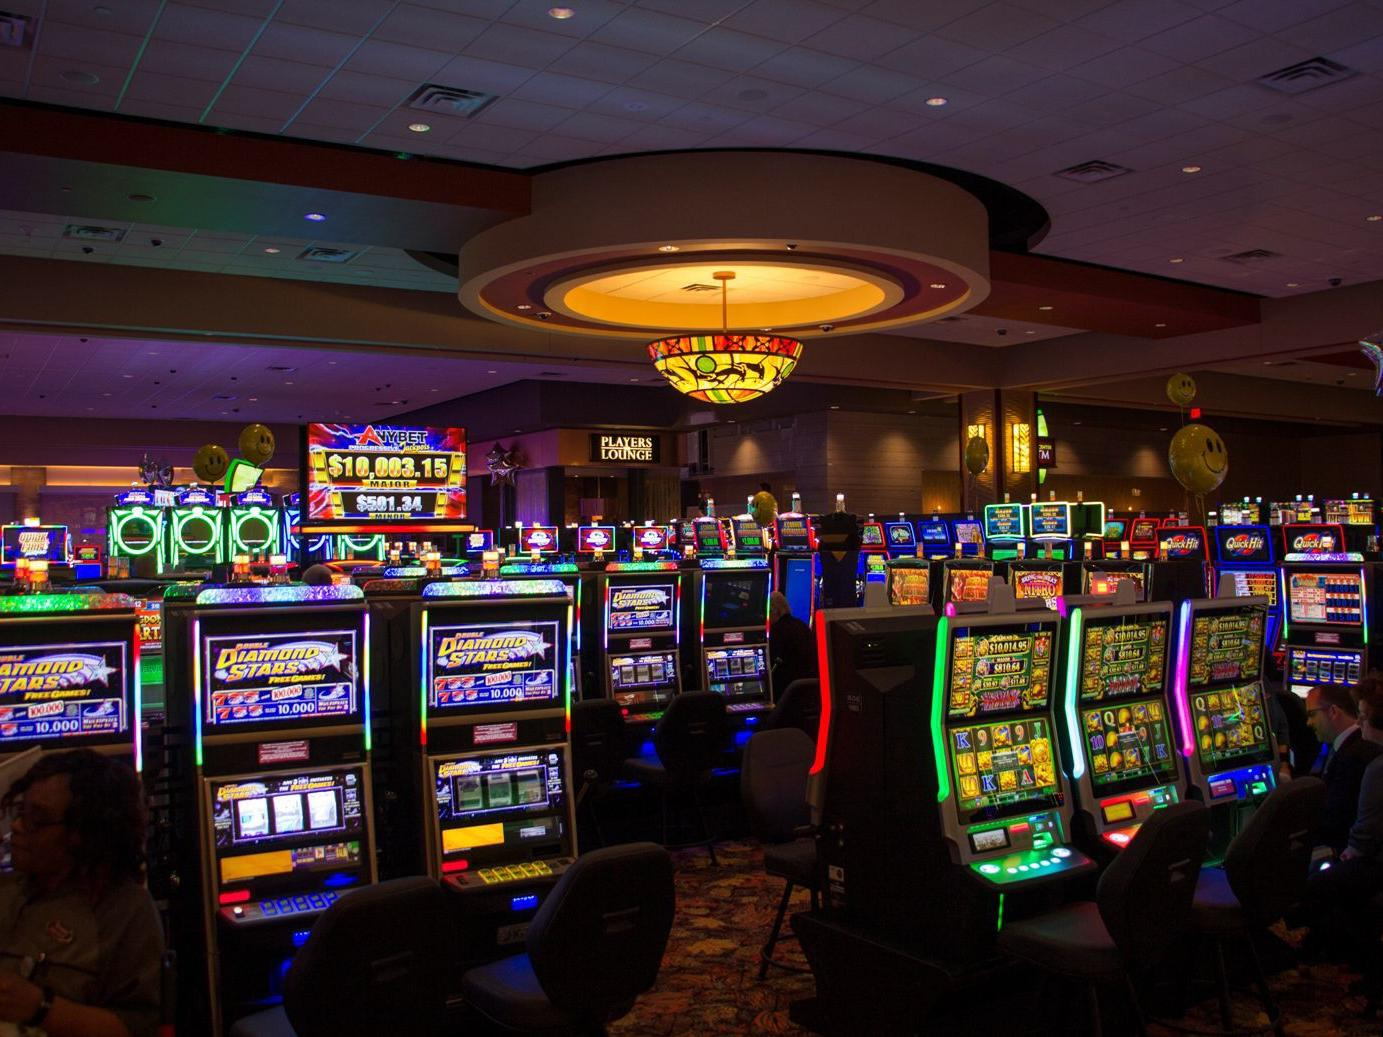 South Bend tribal casino seeking to add sports wagering, table games    Gambling   nwitimes.com